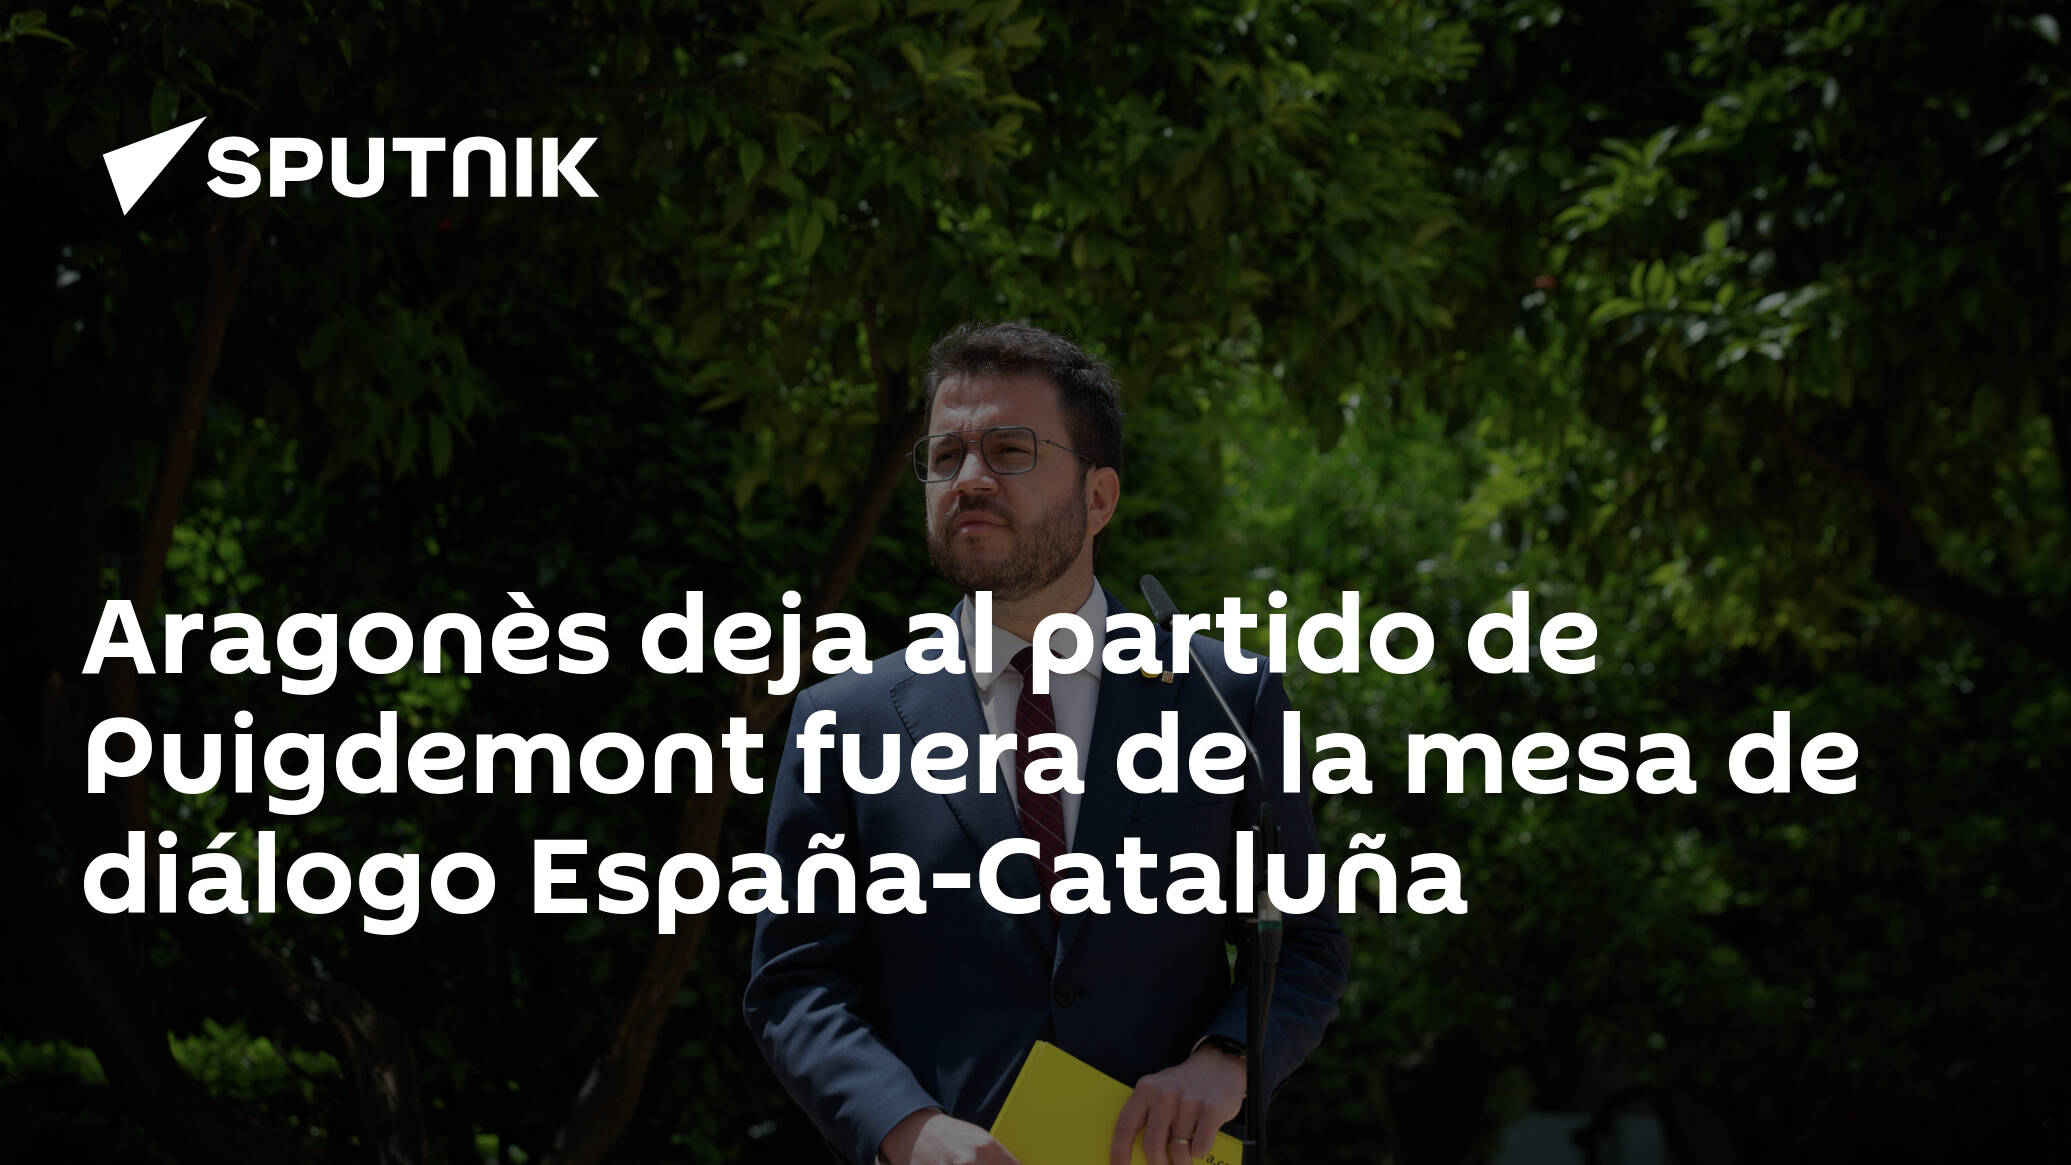 Aragonès deja al partido de Puigdemont fuera de la mesa de diálogo España-Cataluña